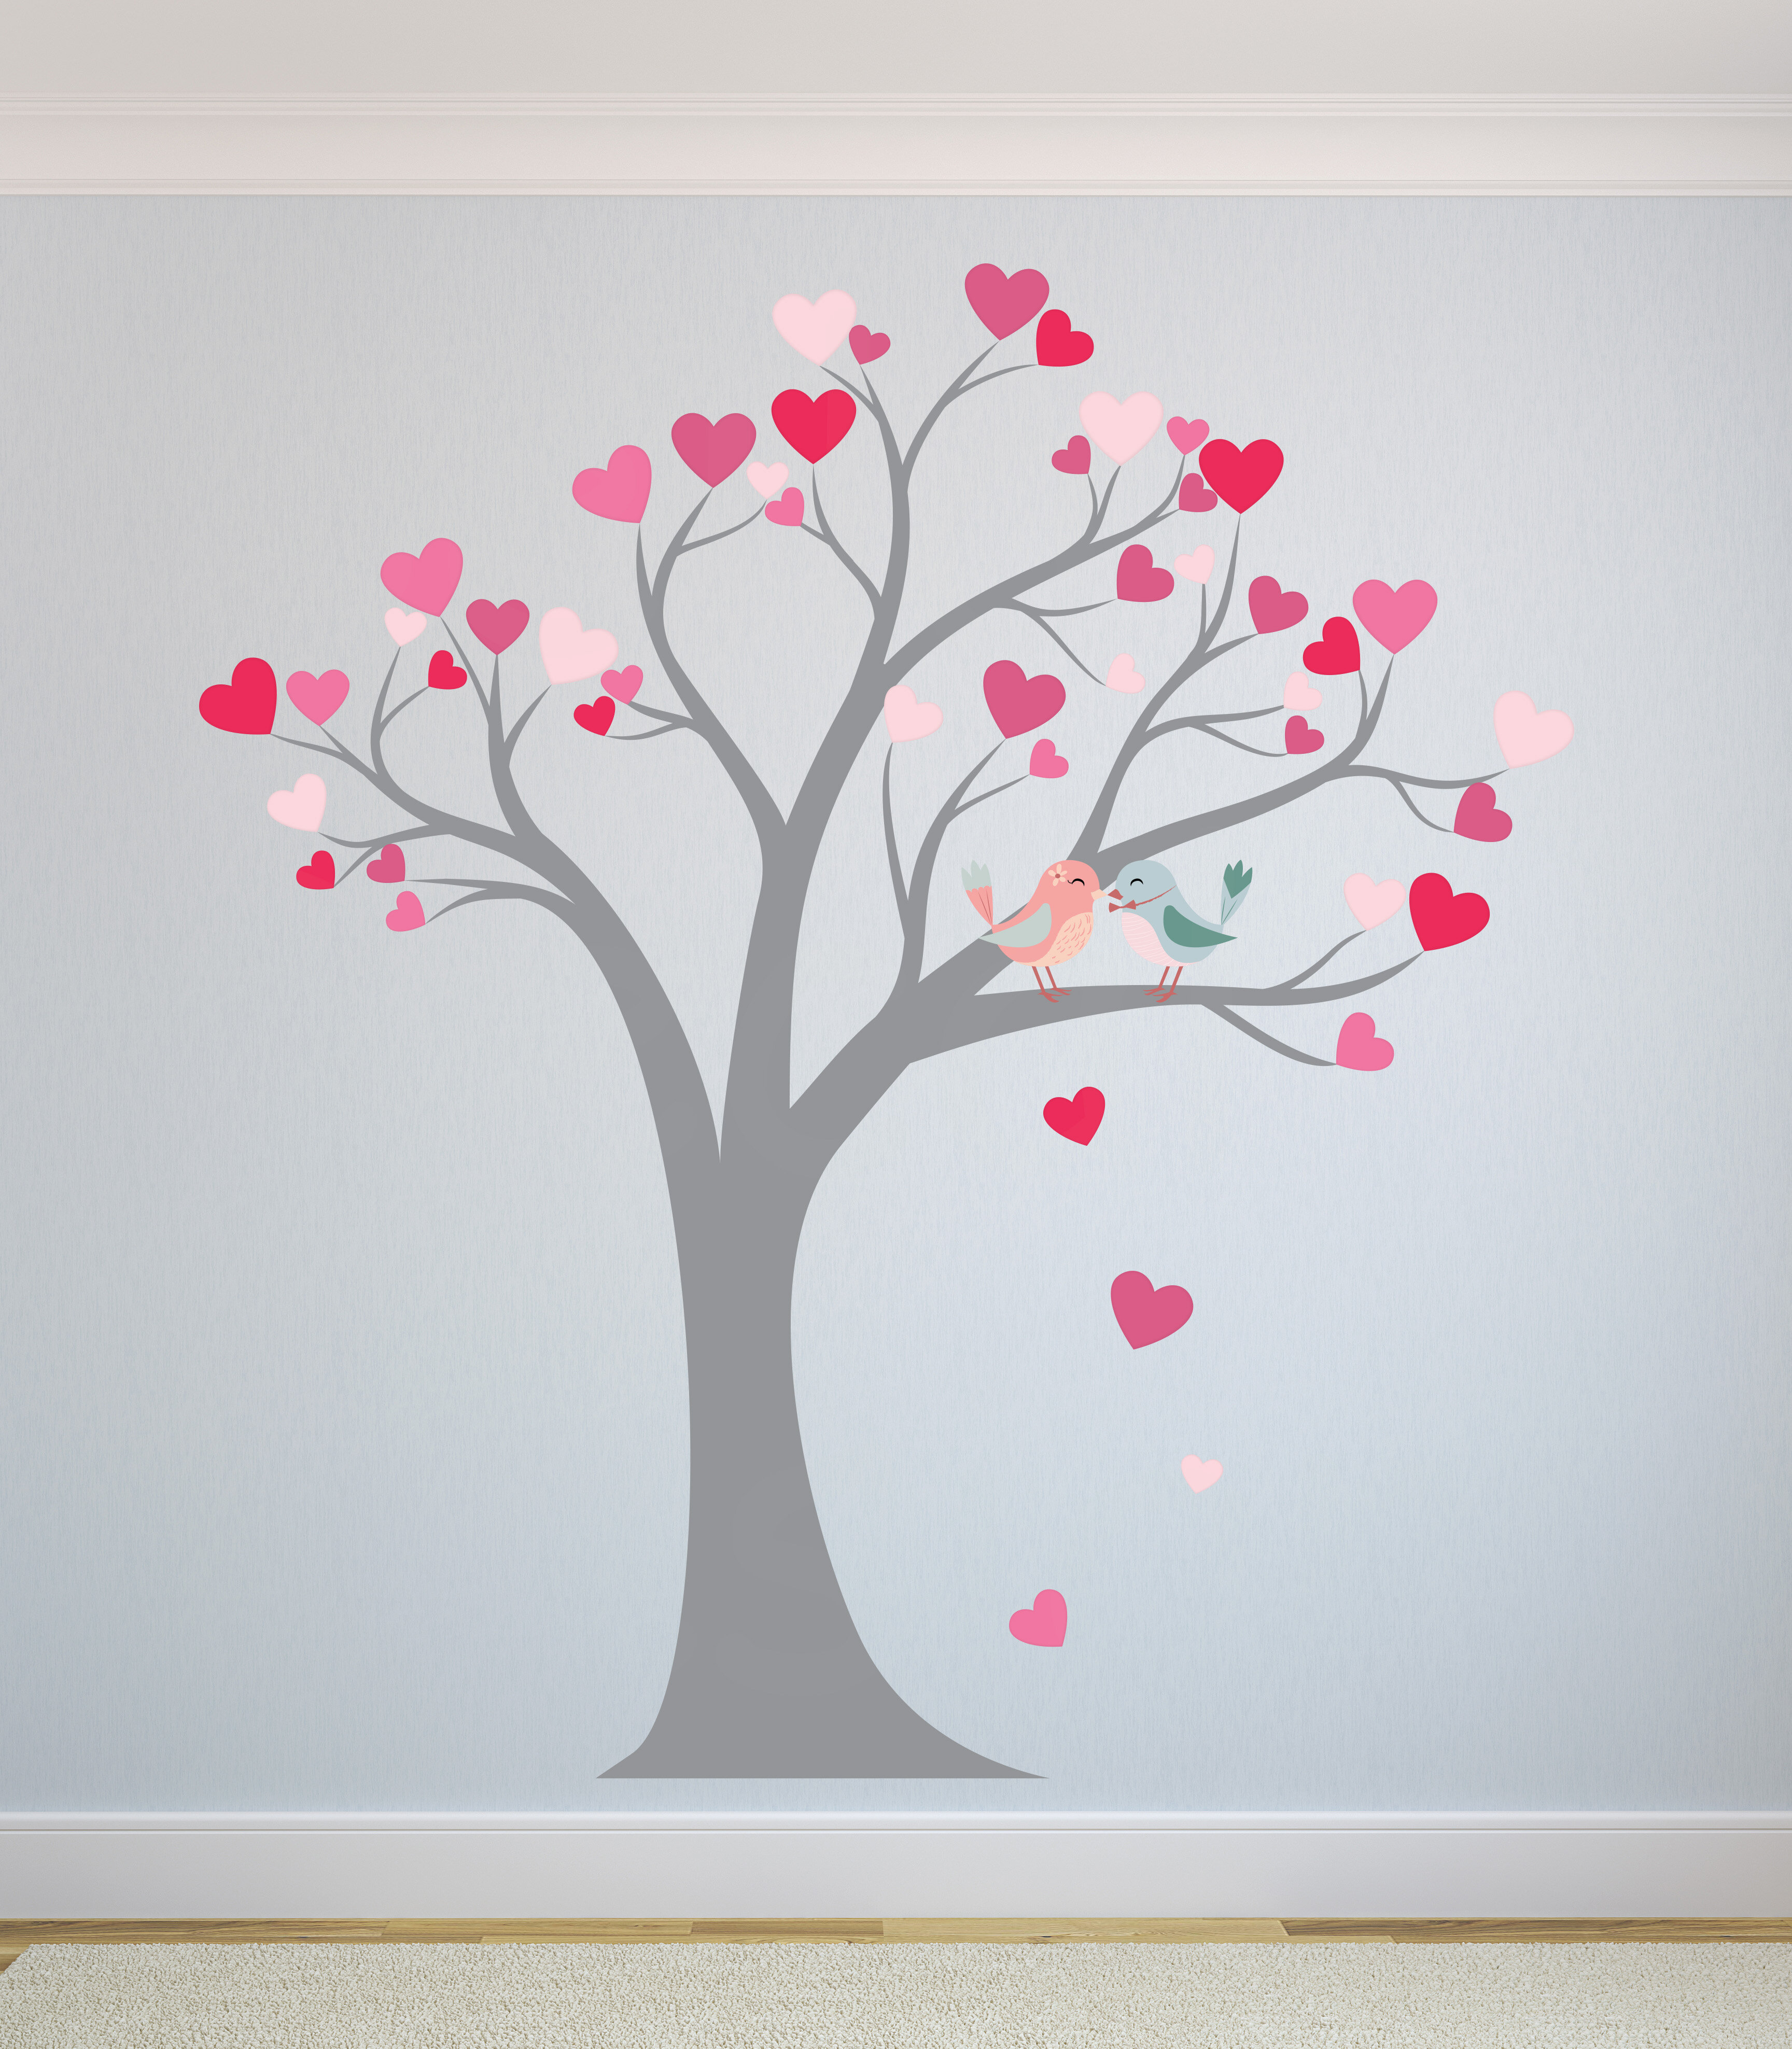 Zoomie Kids Heart Tree Nursery Wall Decal Wayfair